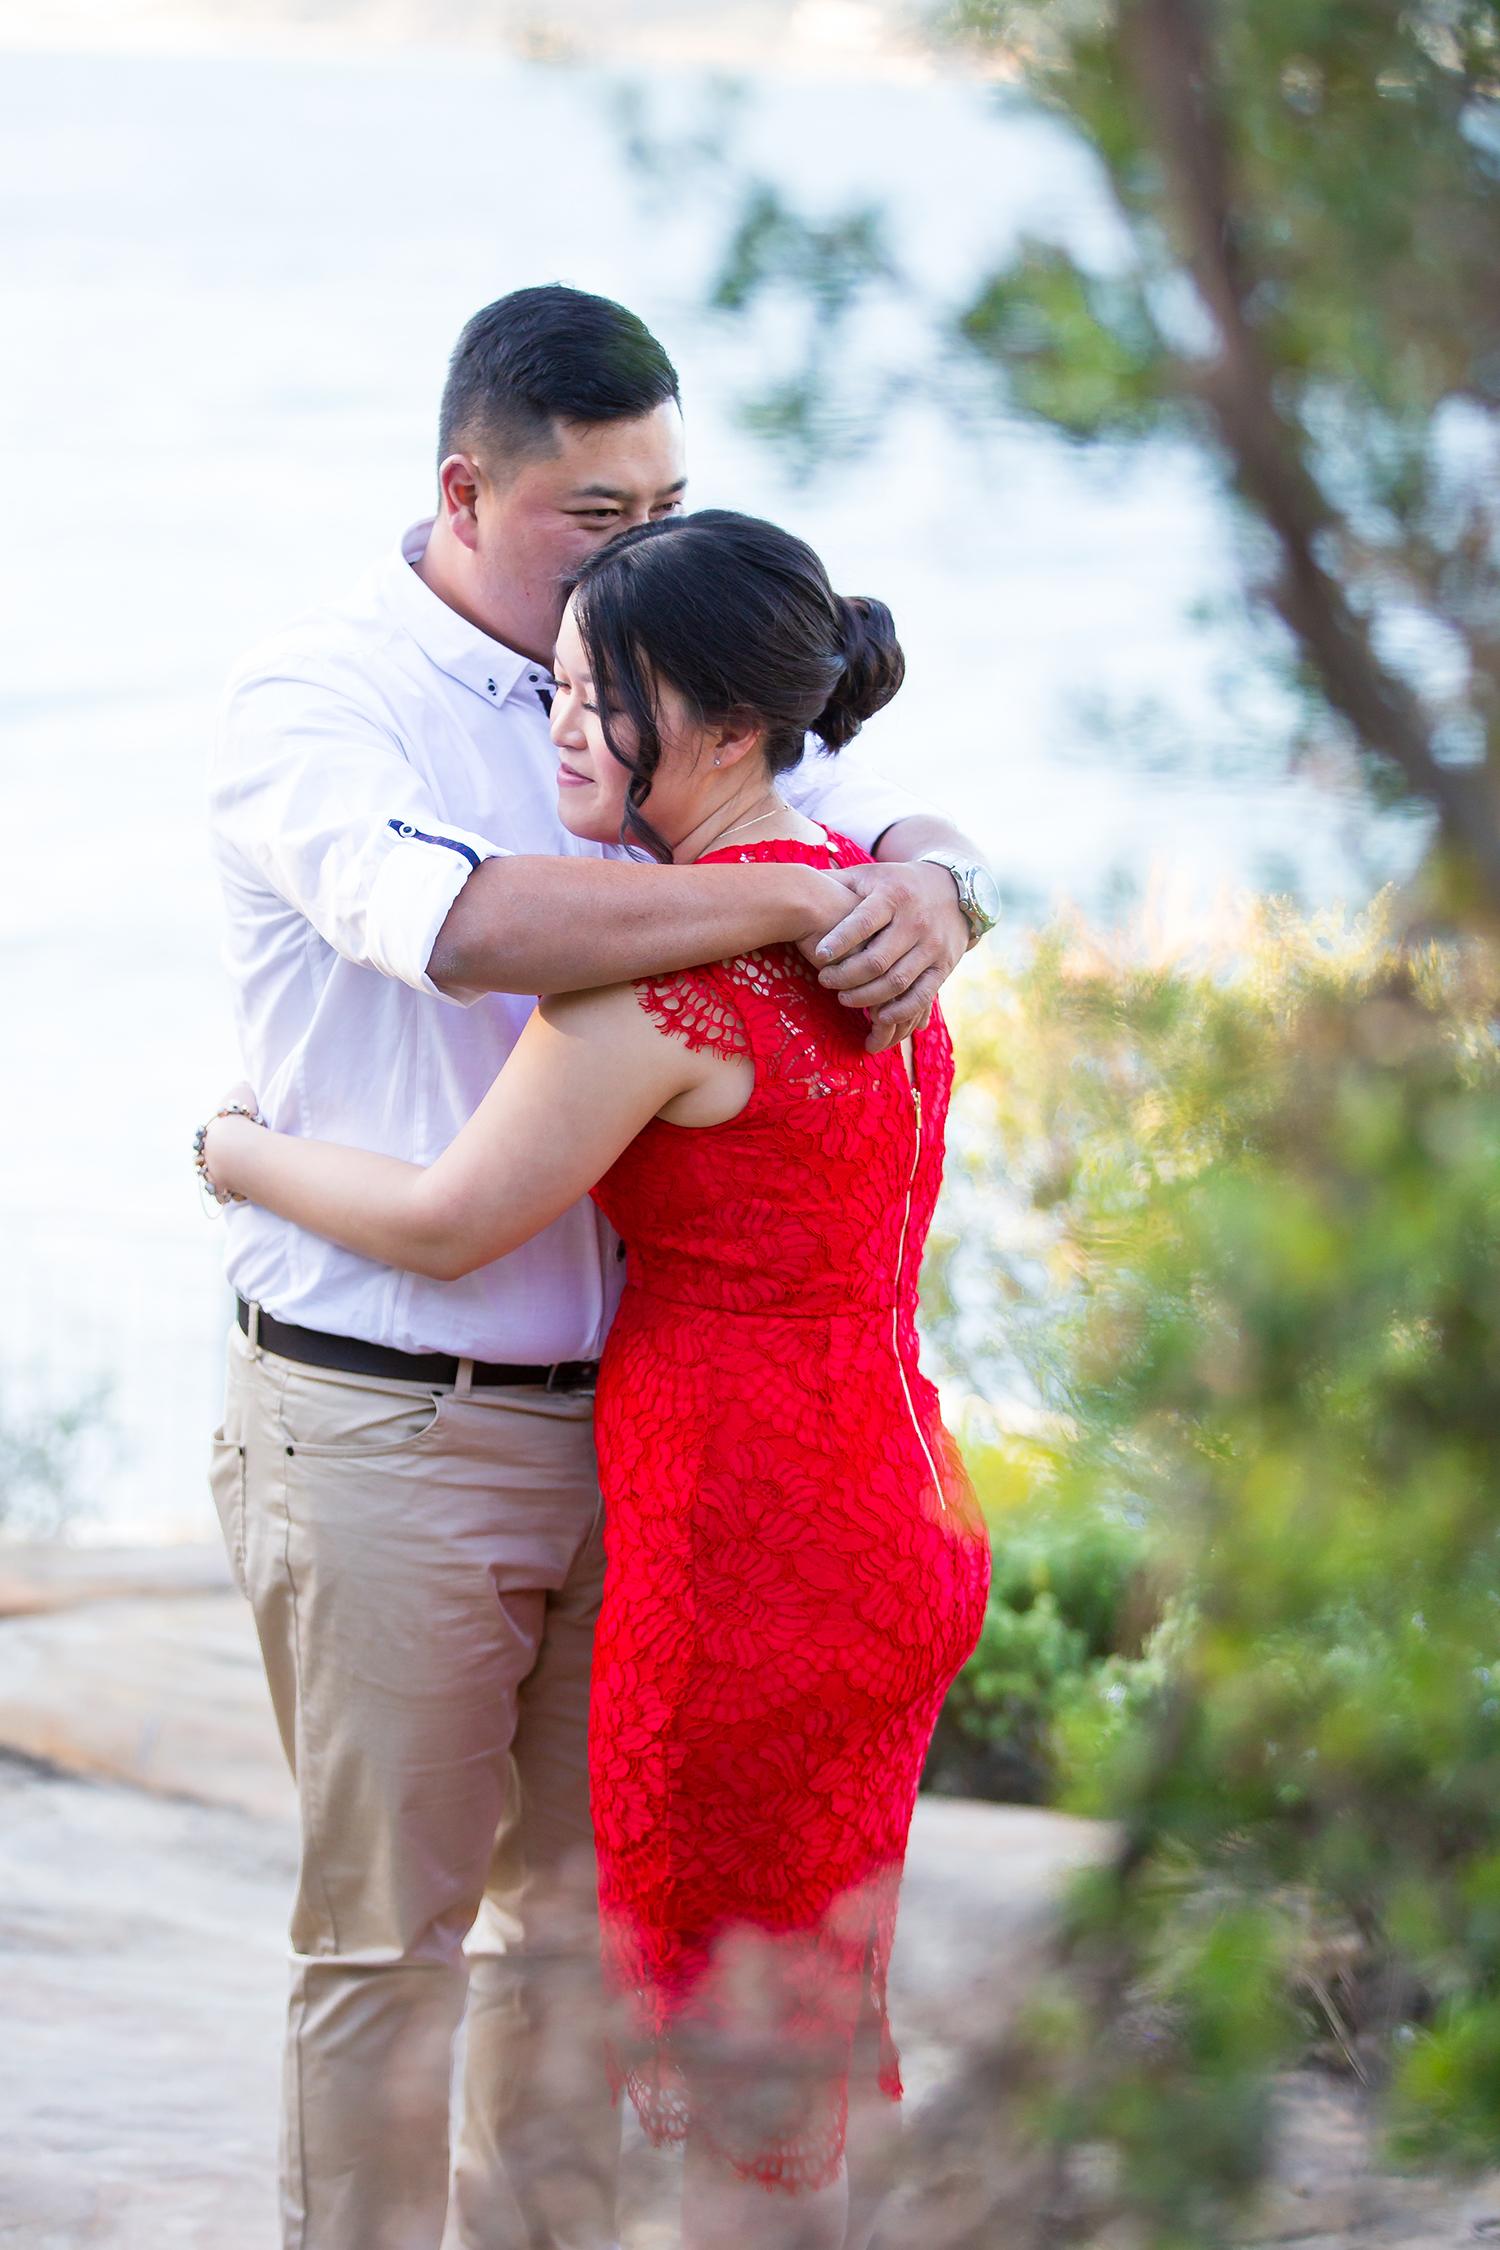 Shelly Beach Manly Pre-Wedding Engagement Session - jennifer Lam Photography (9).jpg